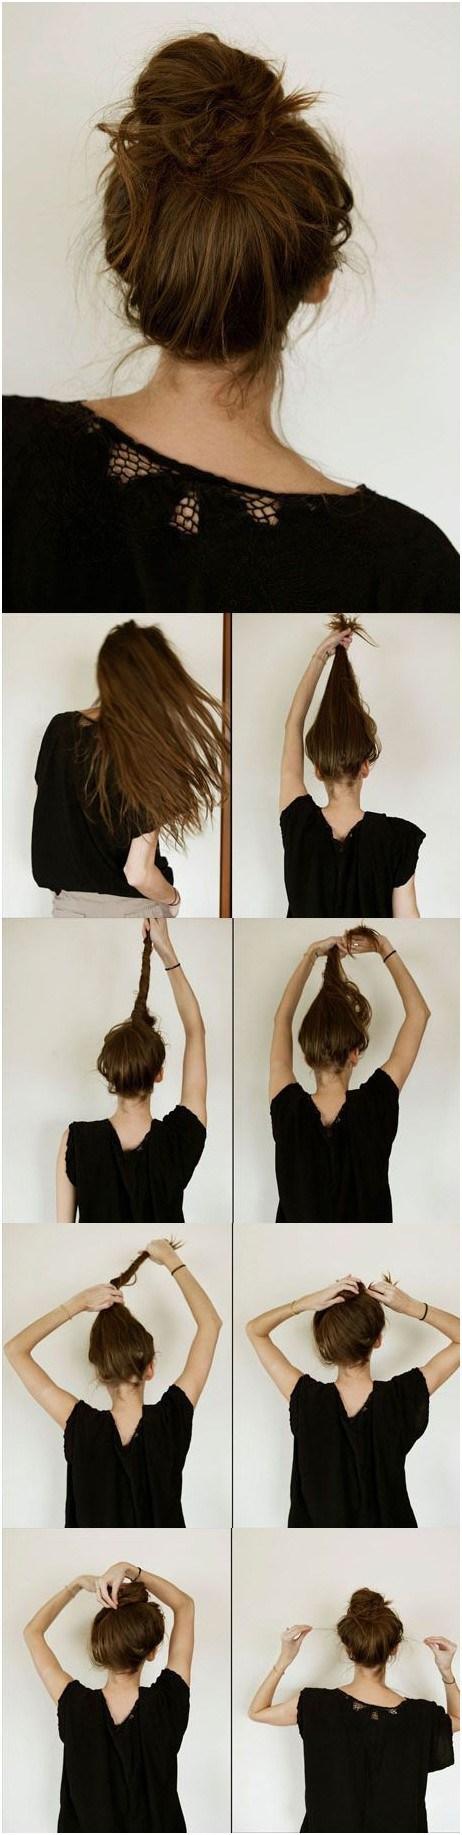 20 Easy Elegant Step-by-Step Hair Tutorials for Long ...